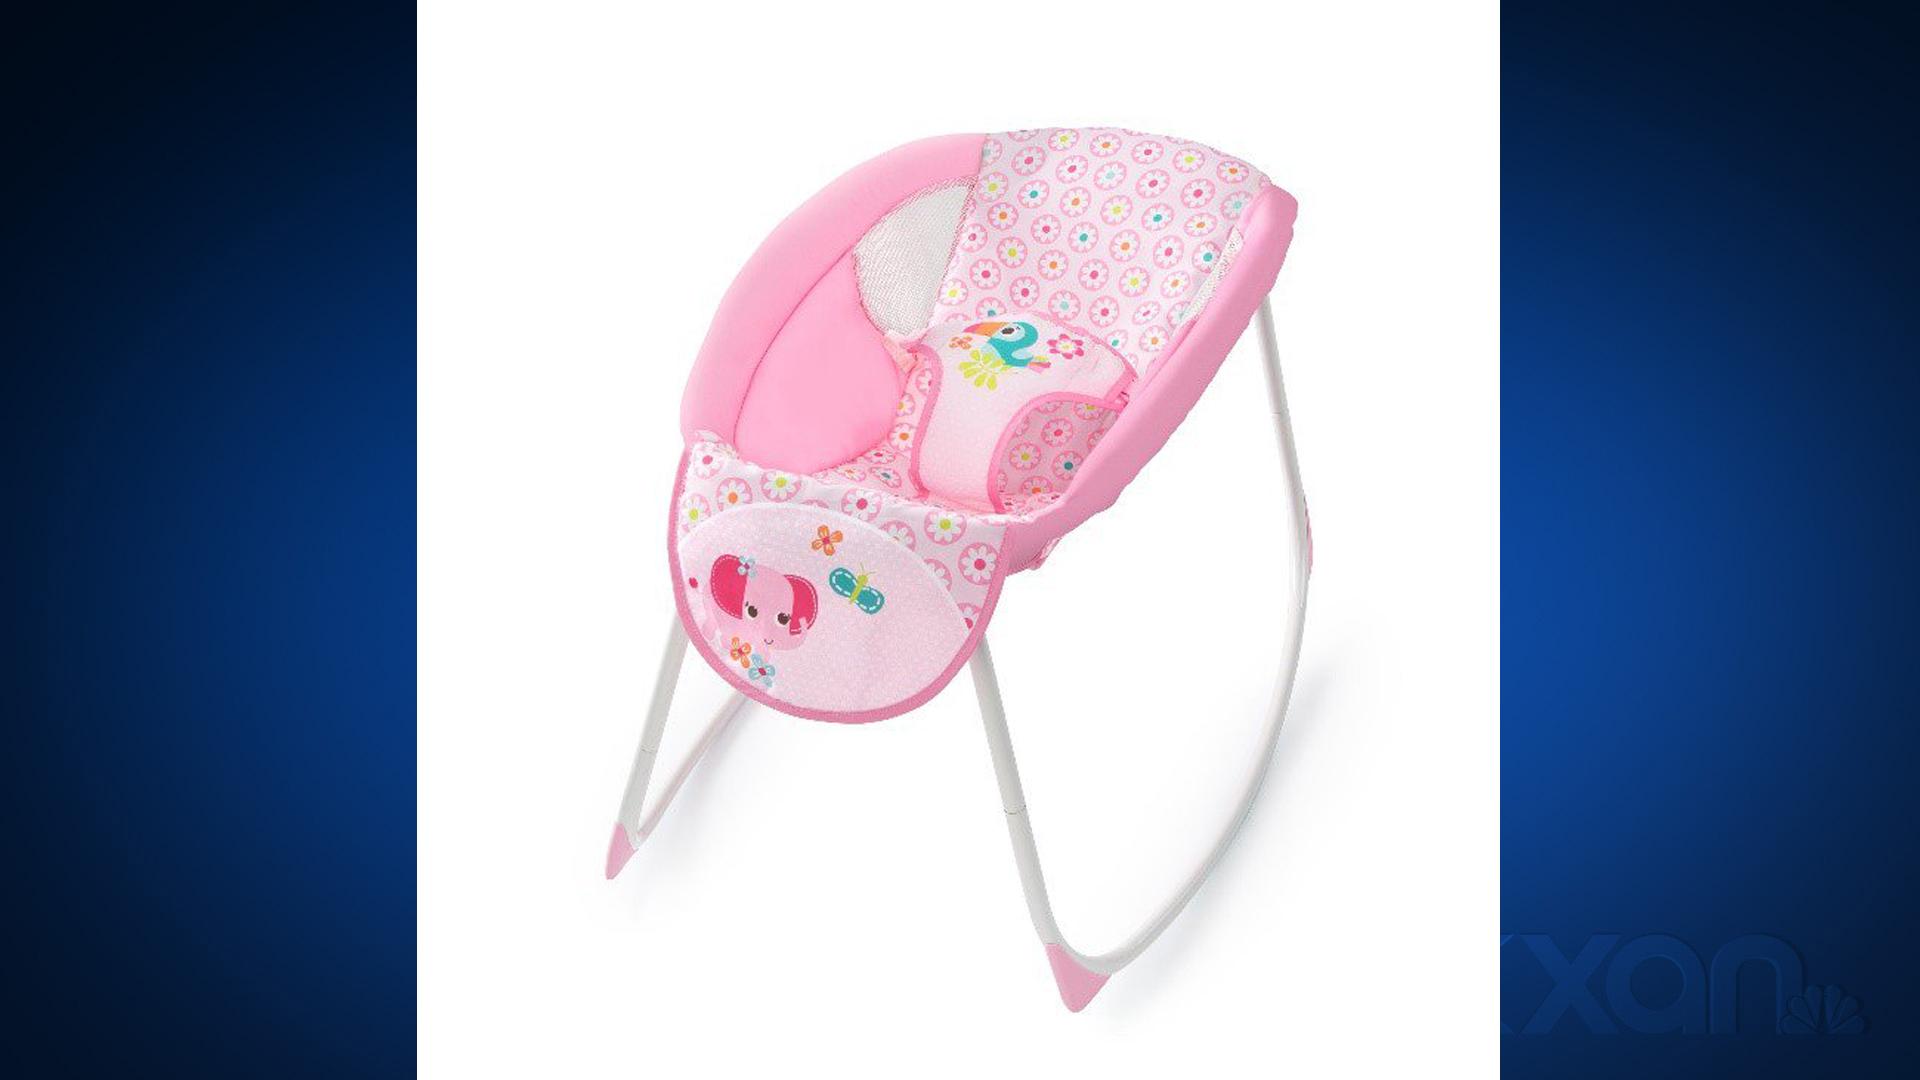 baby-sleeper-recall_1556319277670.jpg